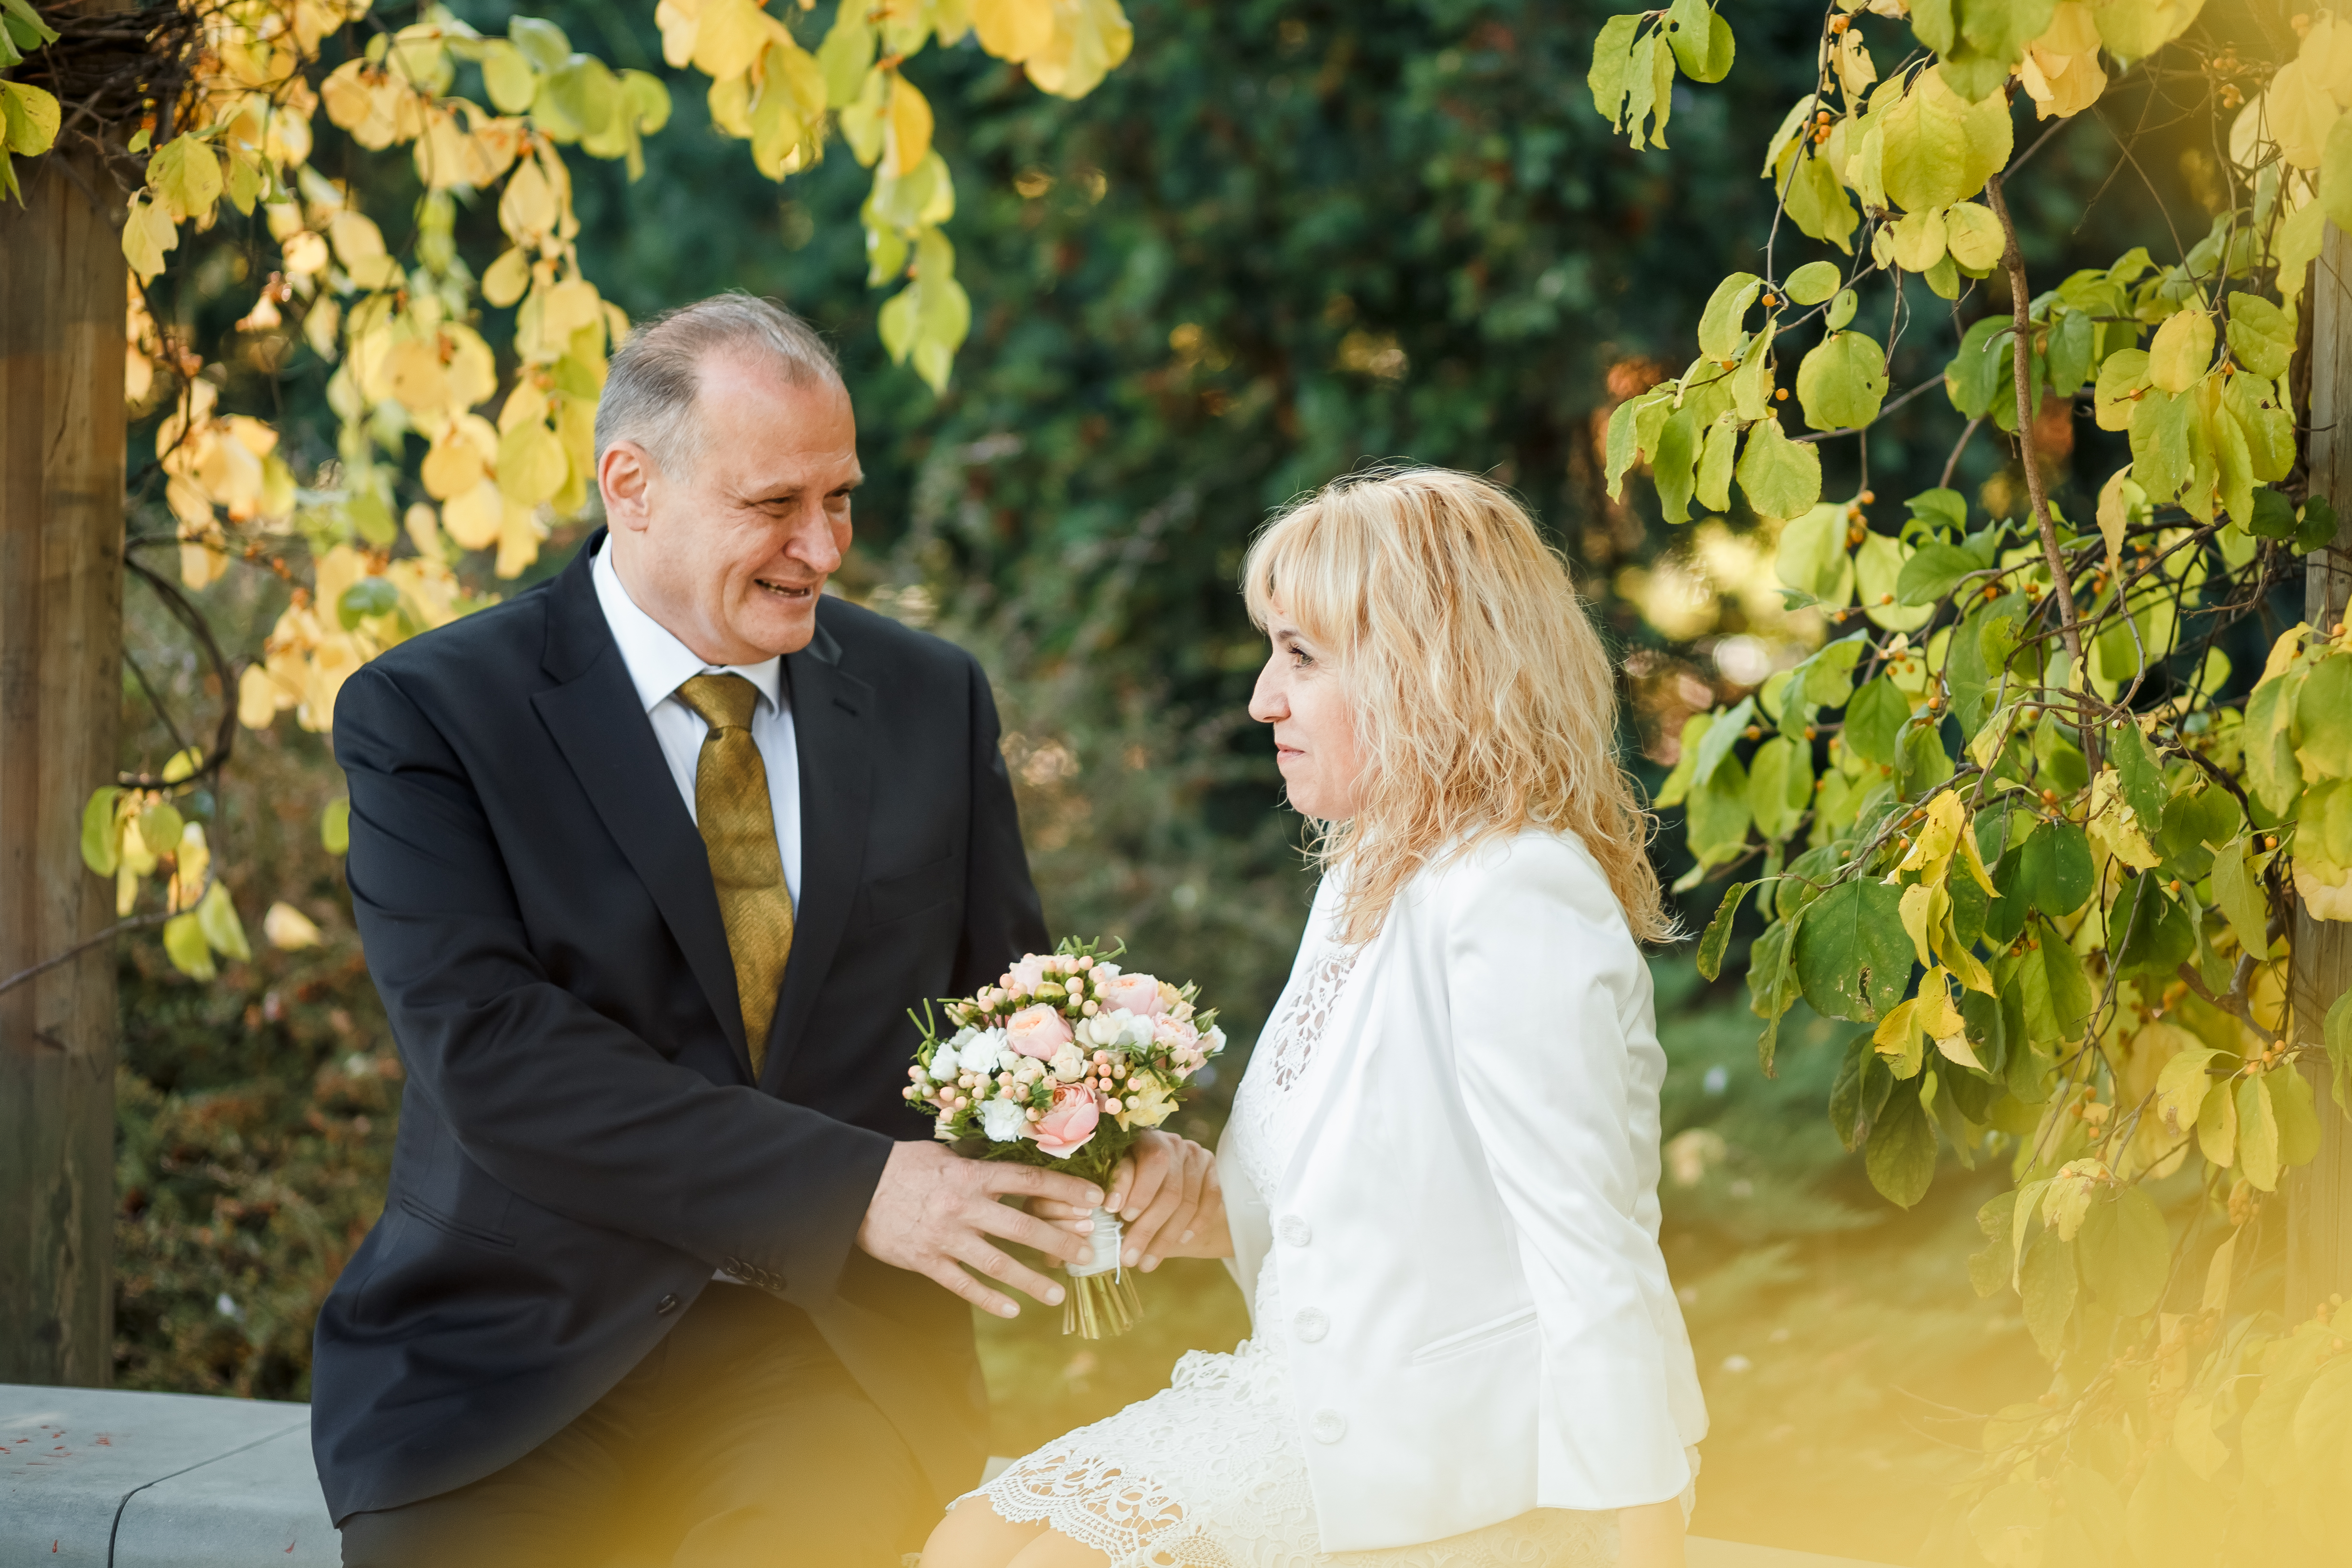 Замуж за поляка, какие трудности и сложности предстоят перед тем как выйти замуж за поляка-4